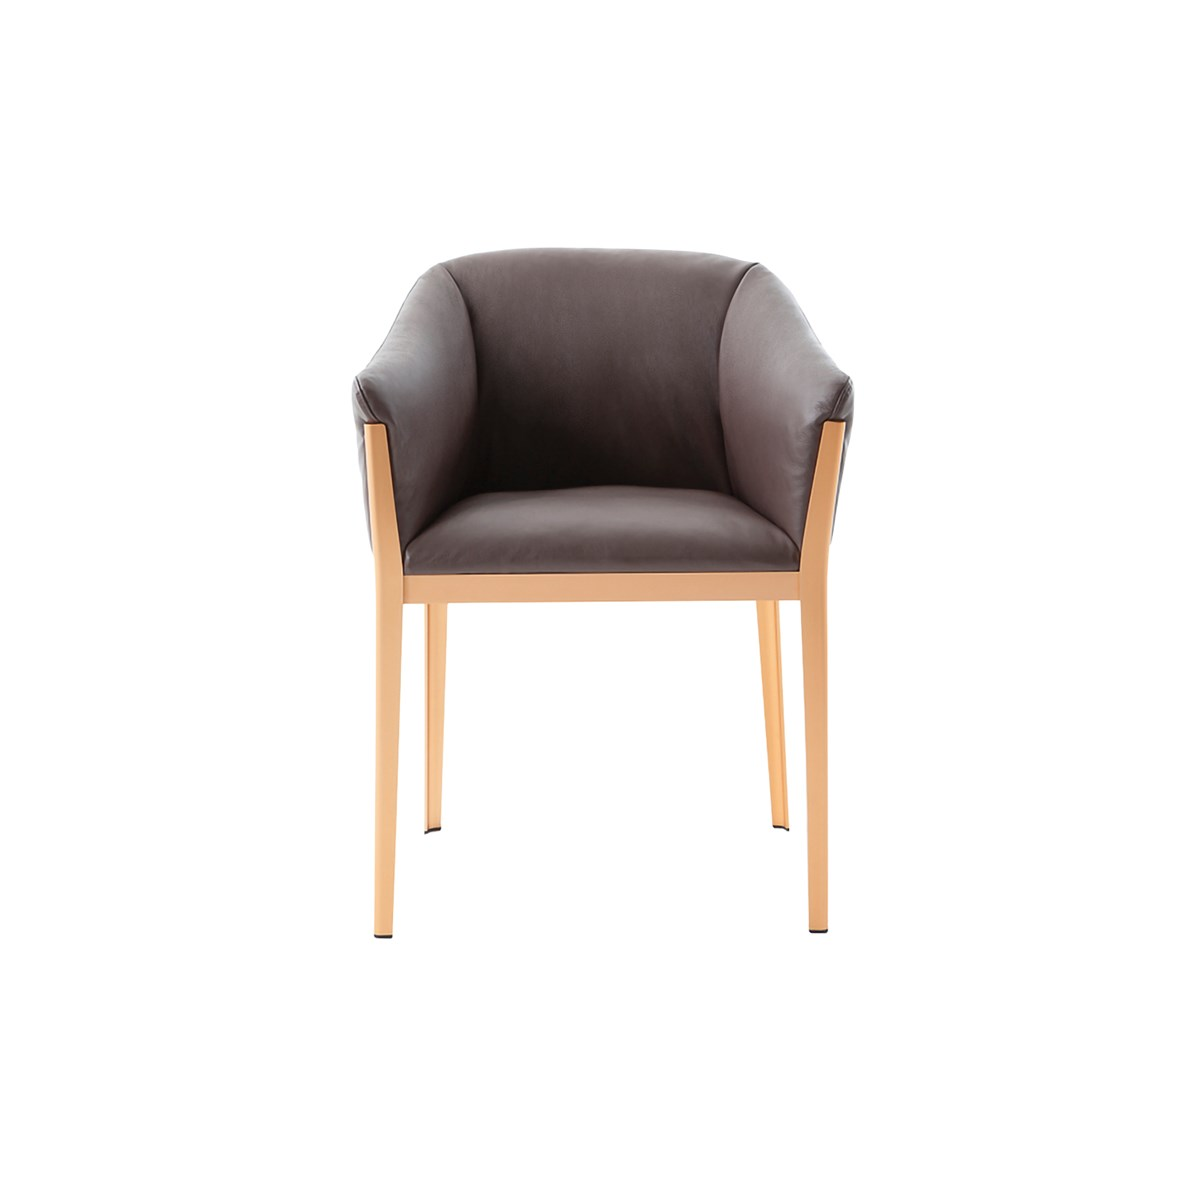 Cassina-Ronan-Erwan-Bouroullec-Cotone-Armchair-Matisse-1